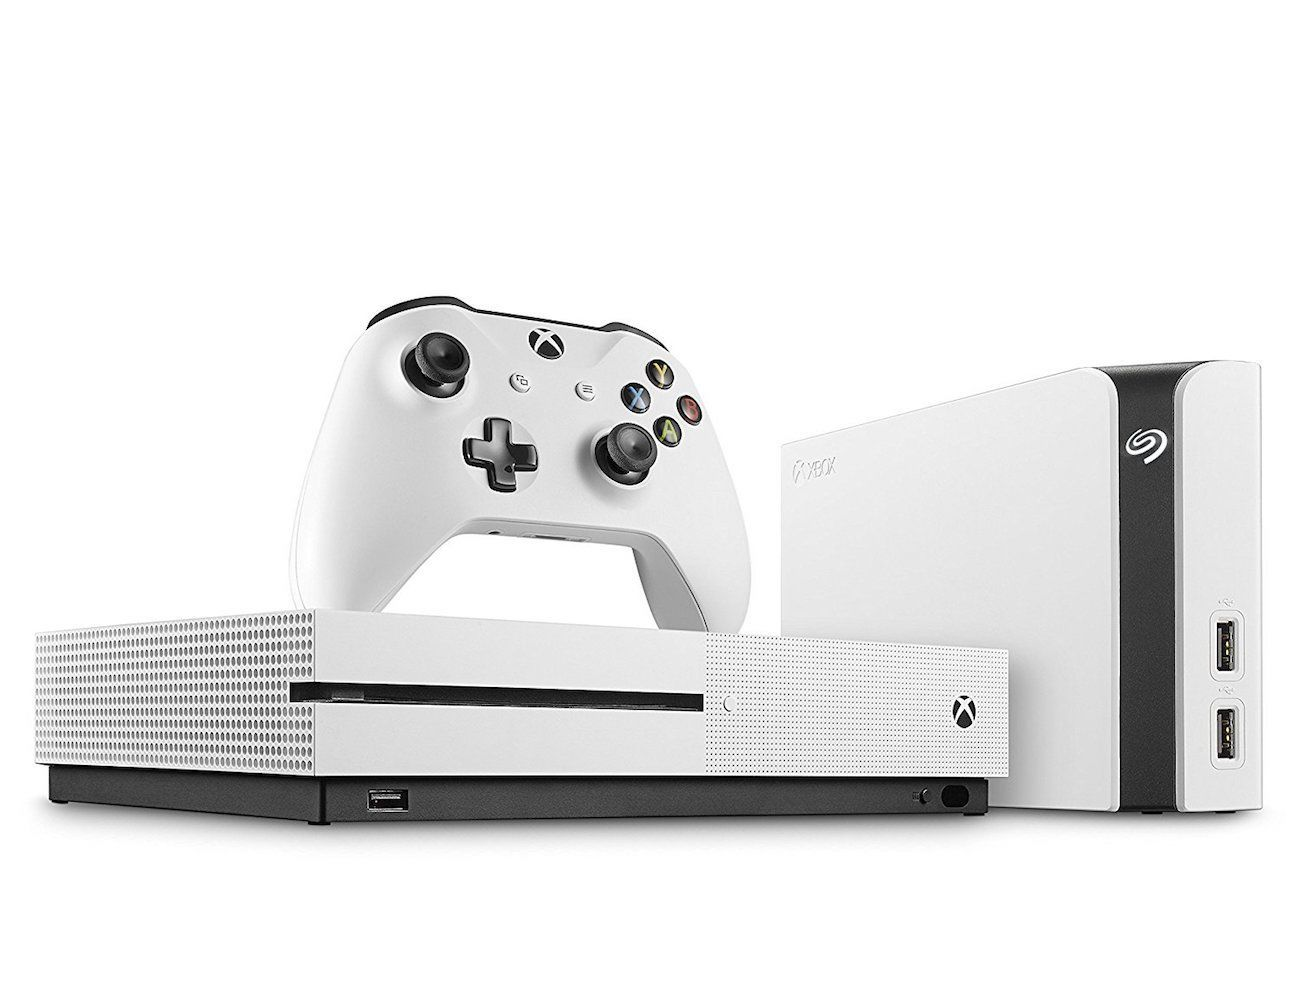 Seagate Xbox Game Drive Hub